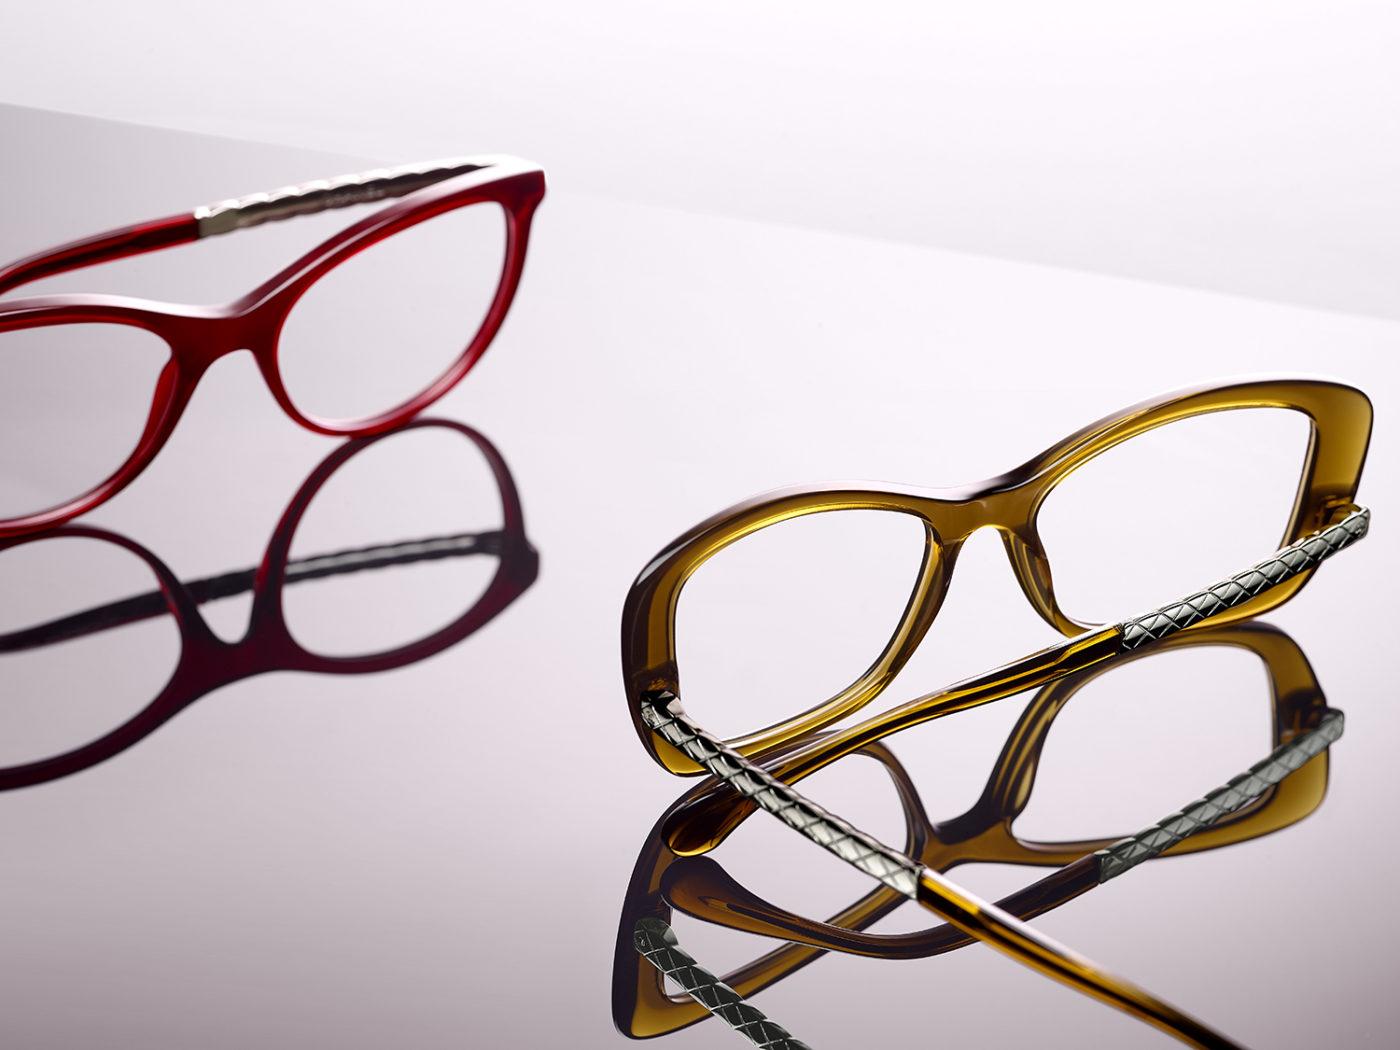 Choosing eyeglass frames